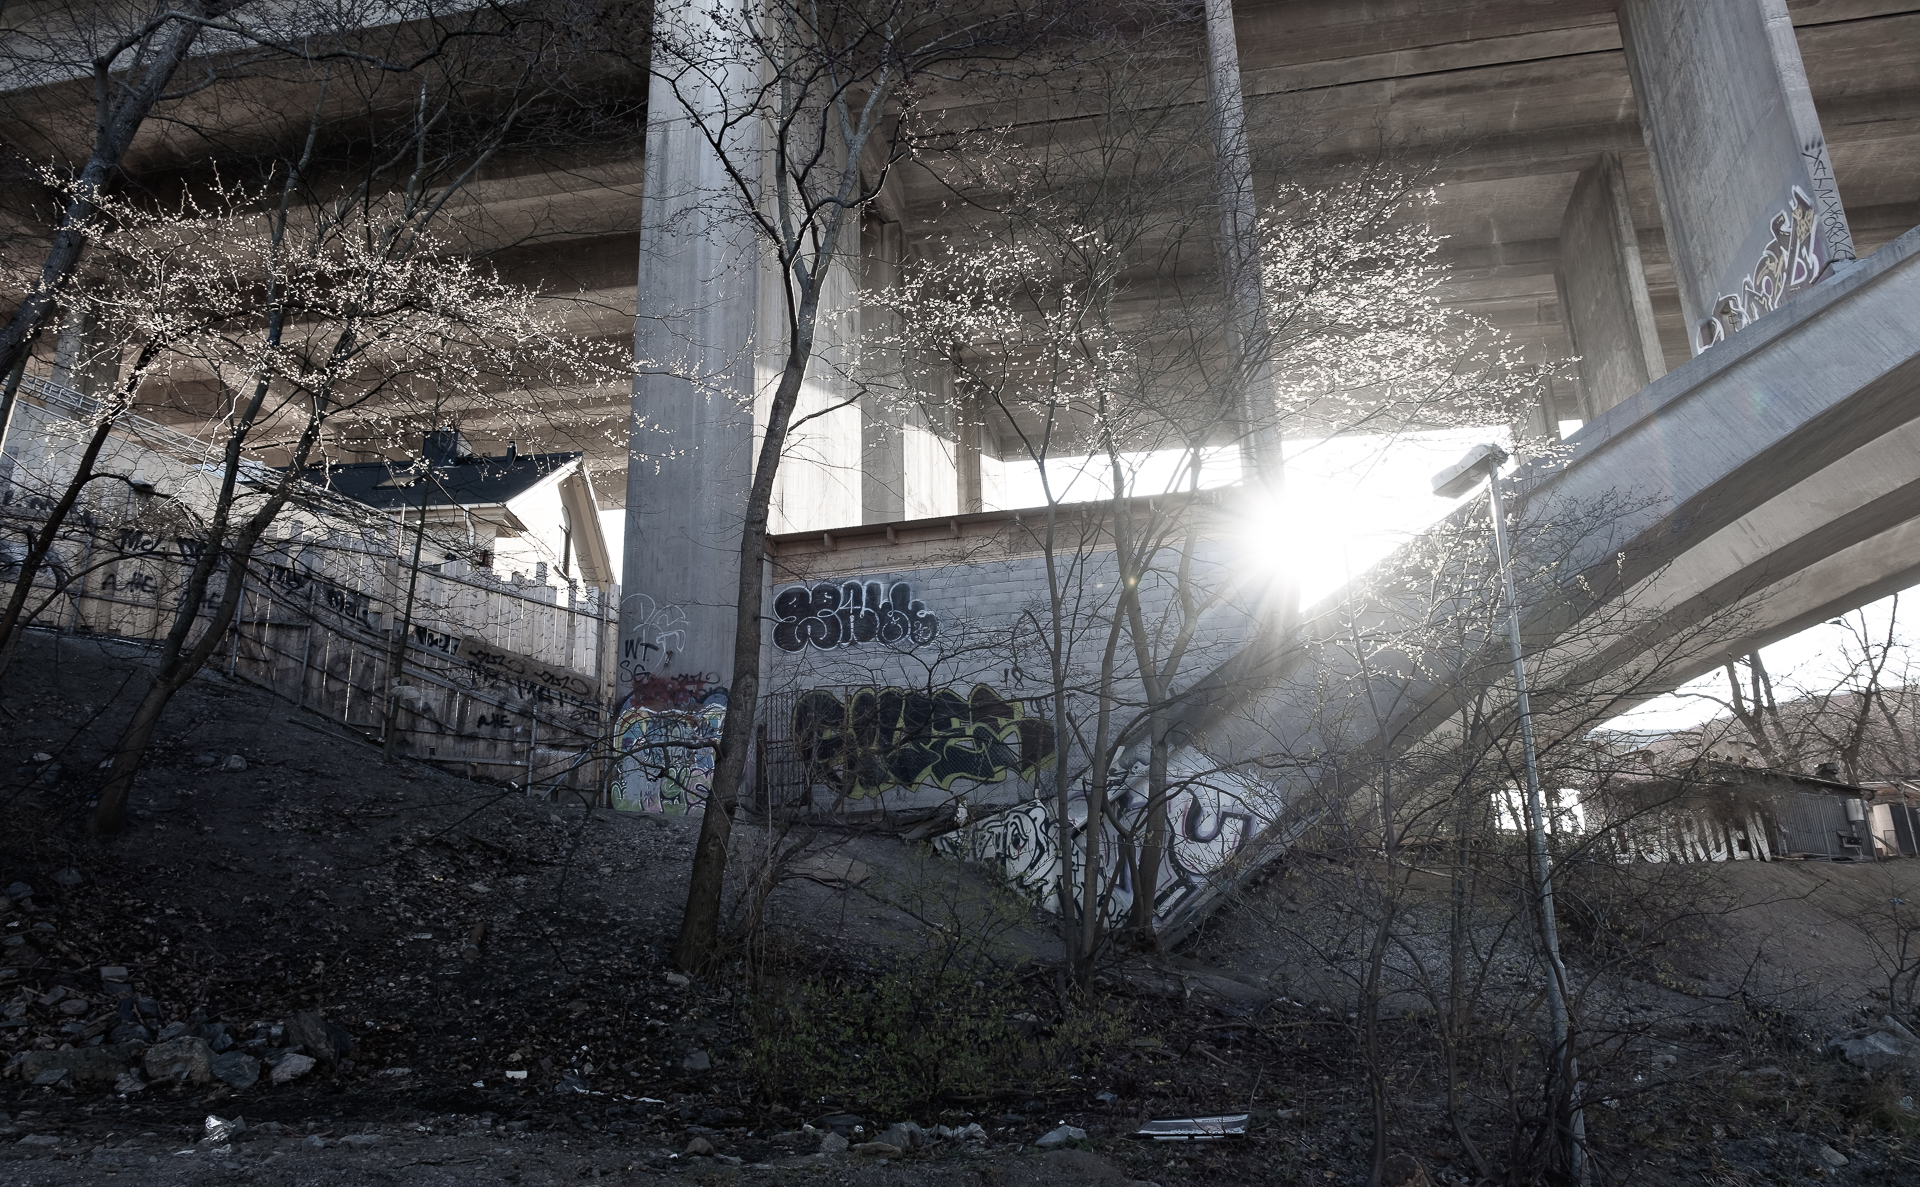 Trees under a bridge